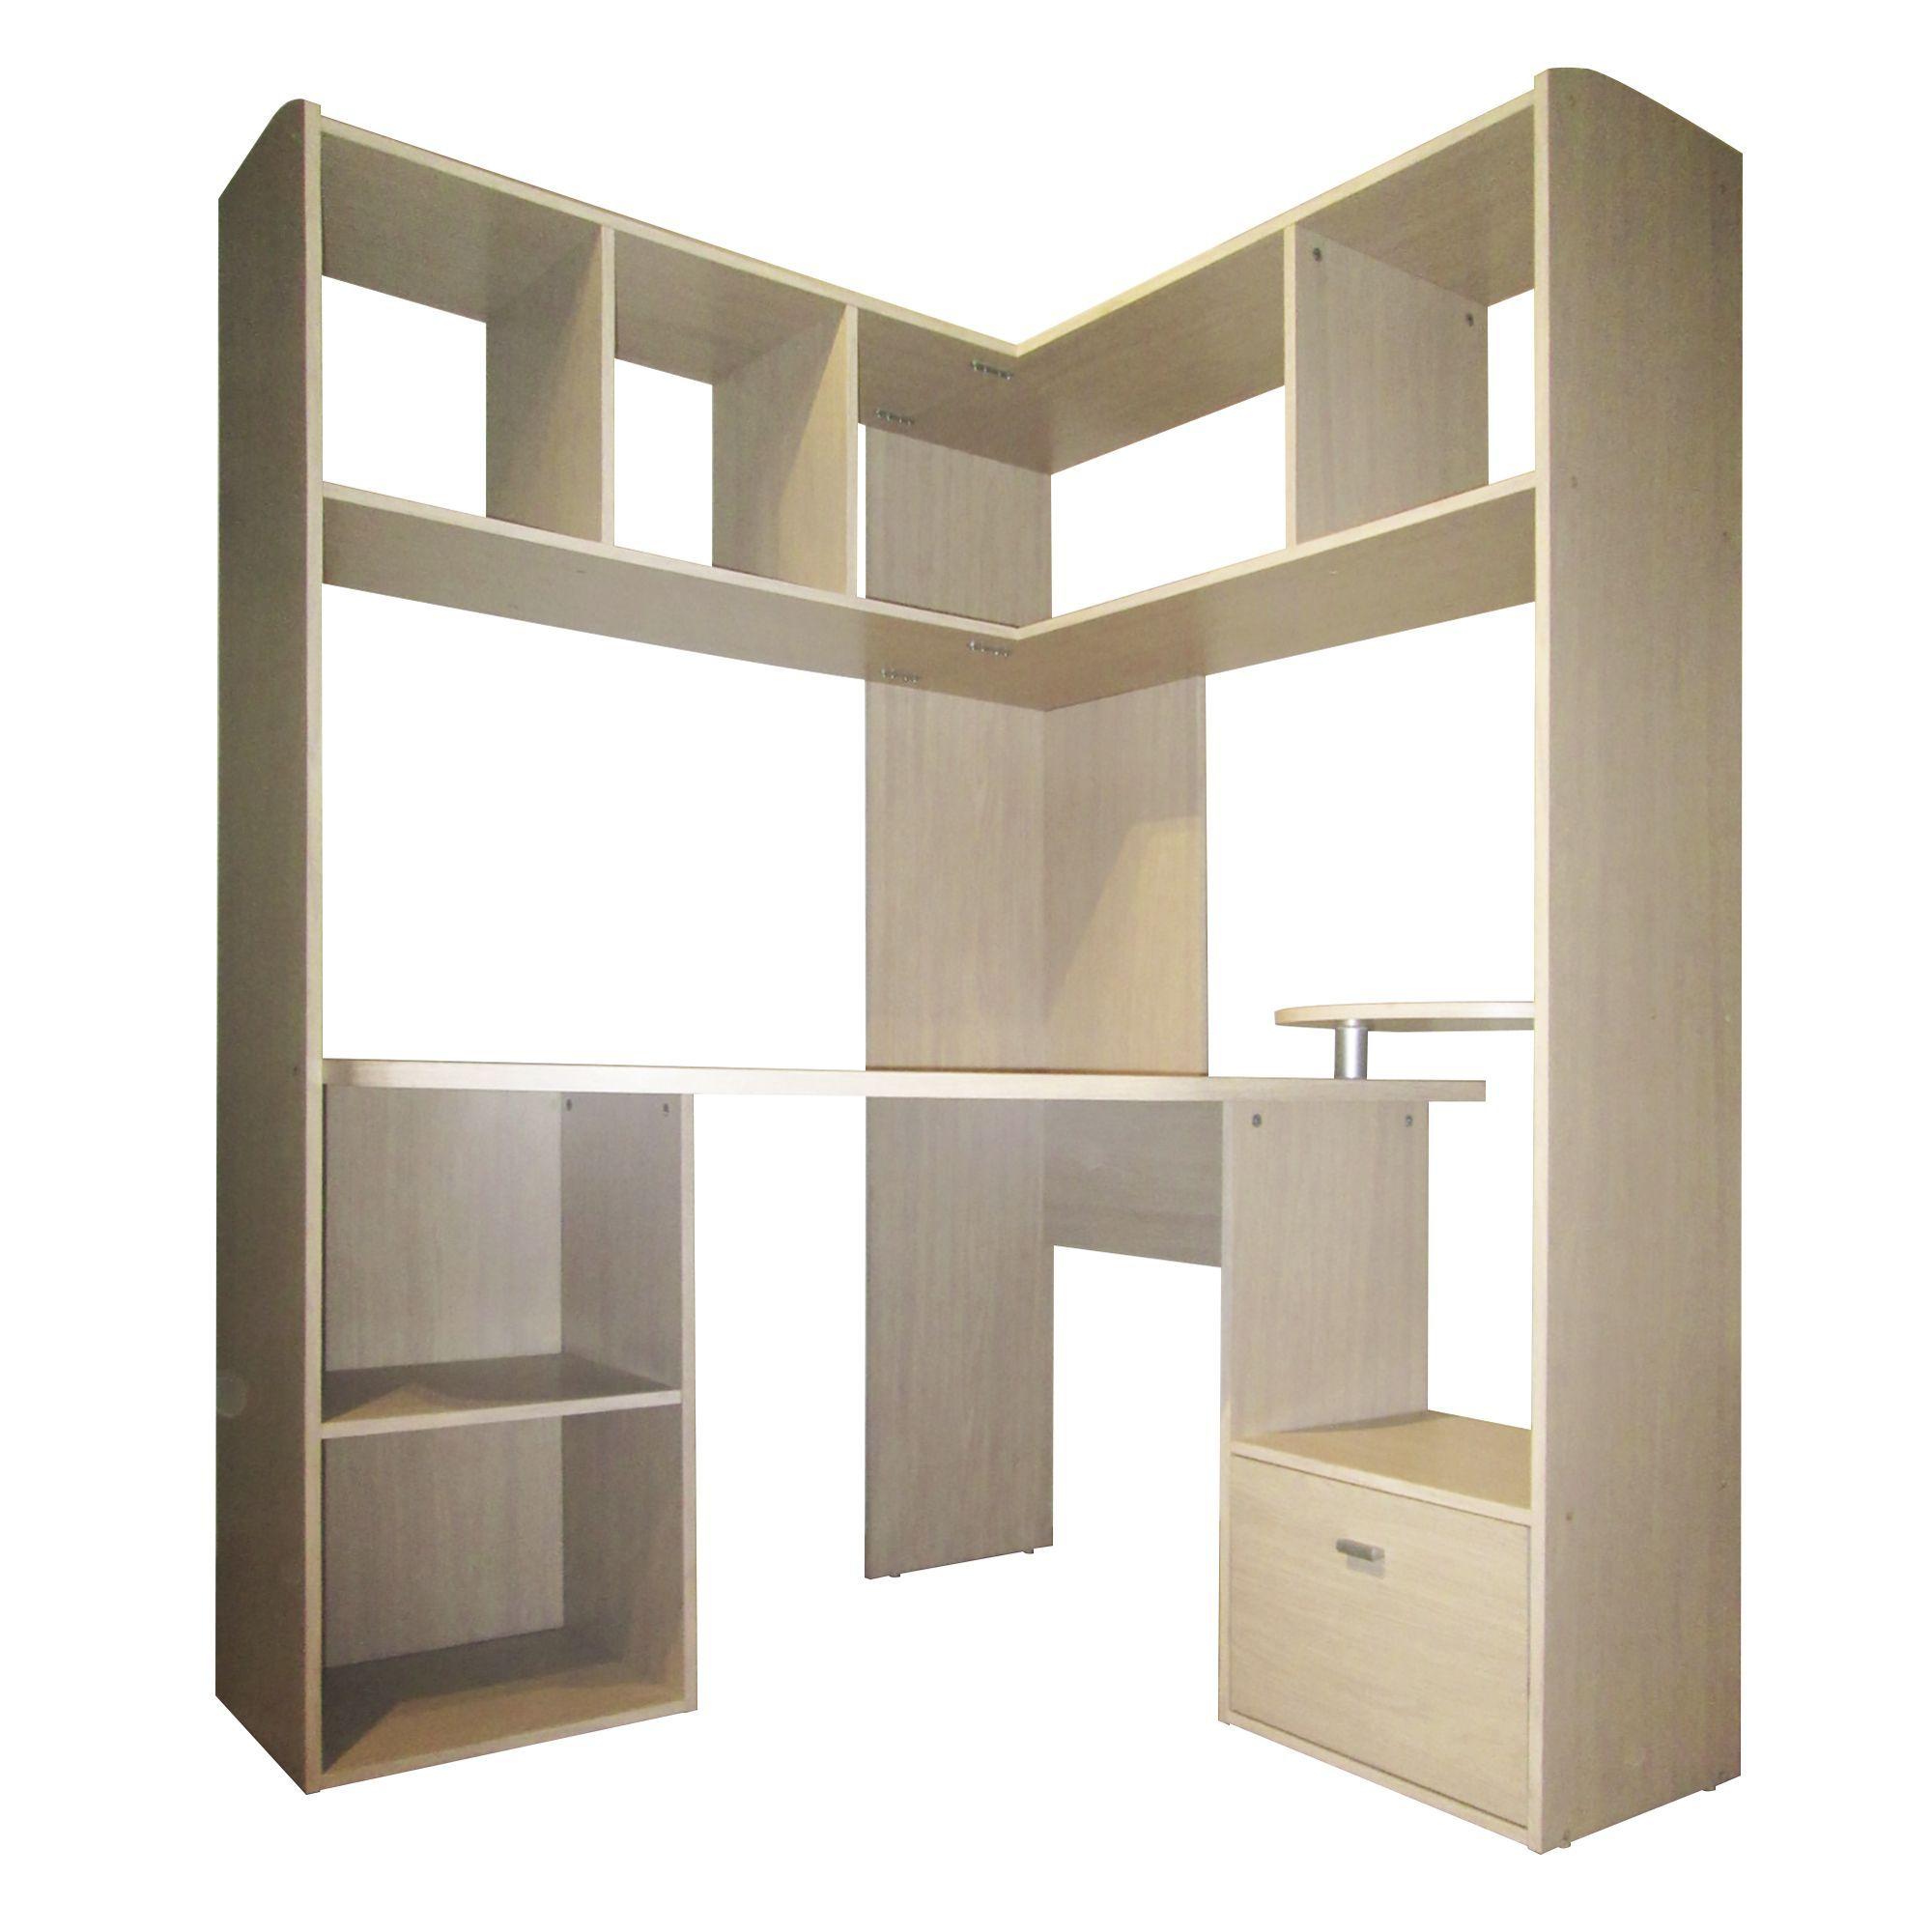 les concernant meuble d angle alinea